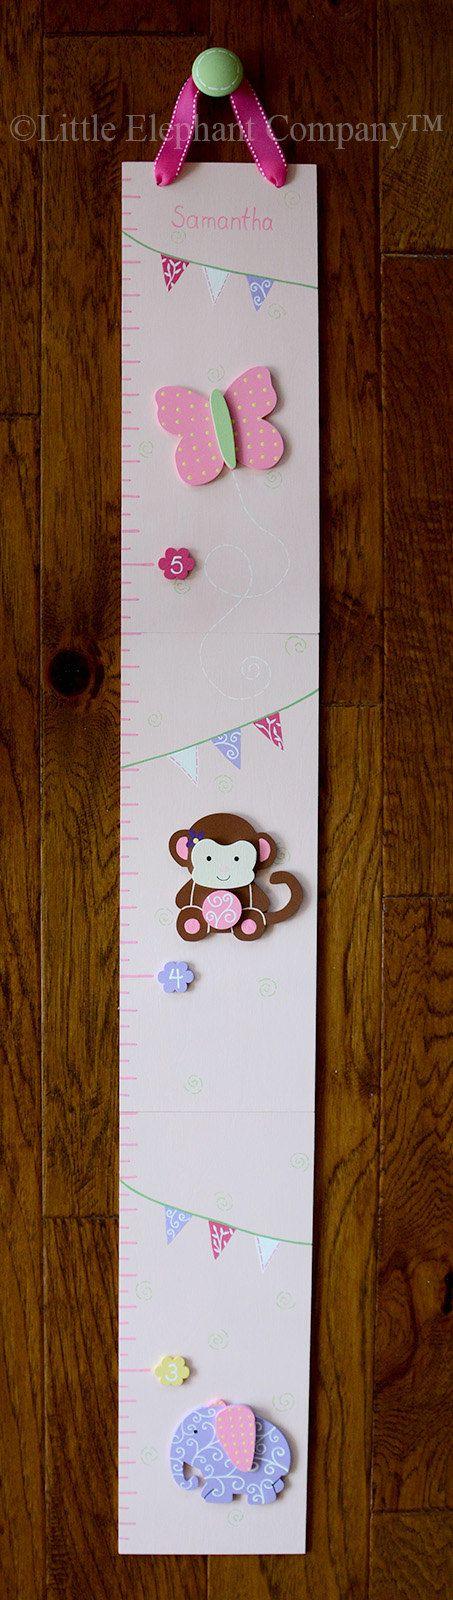 Sweet Girl Pink Jungle Wooden Growth Chart by LittleElephantCo